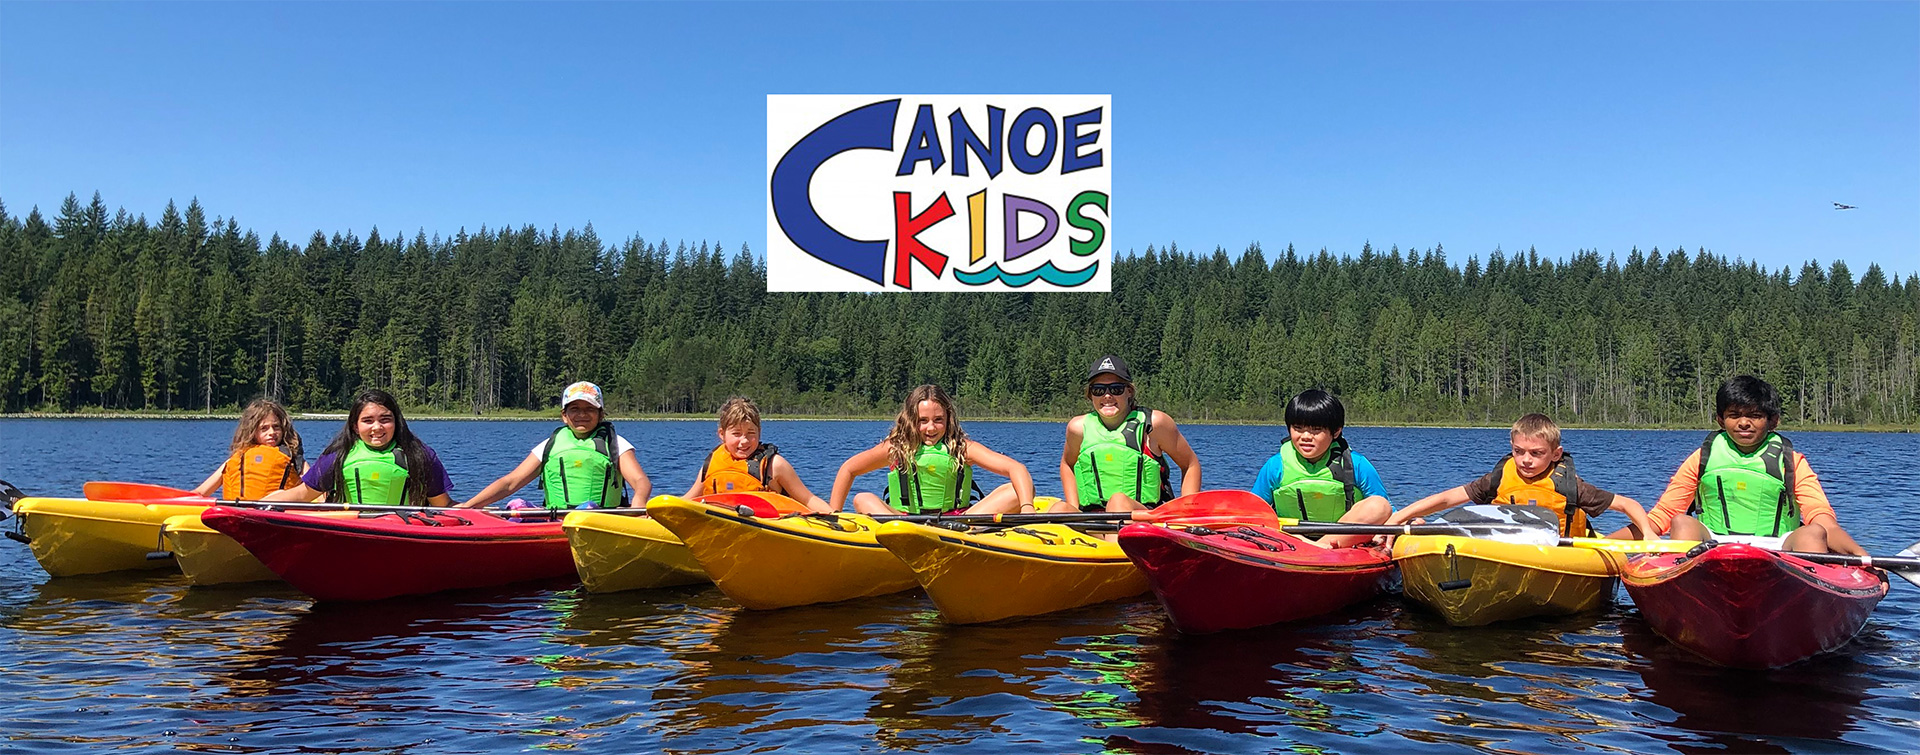 Canoe-Kids-Photo